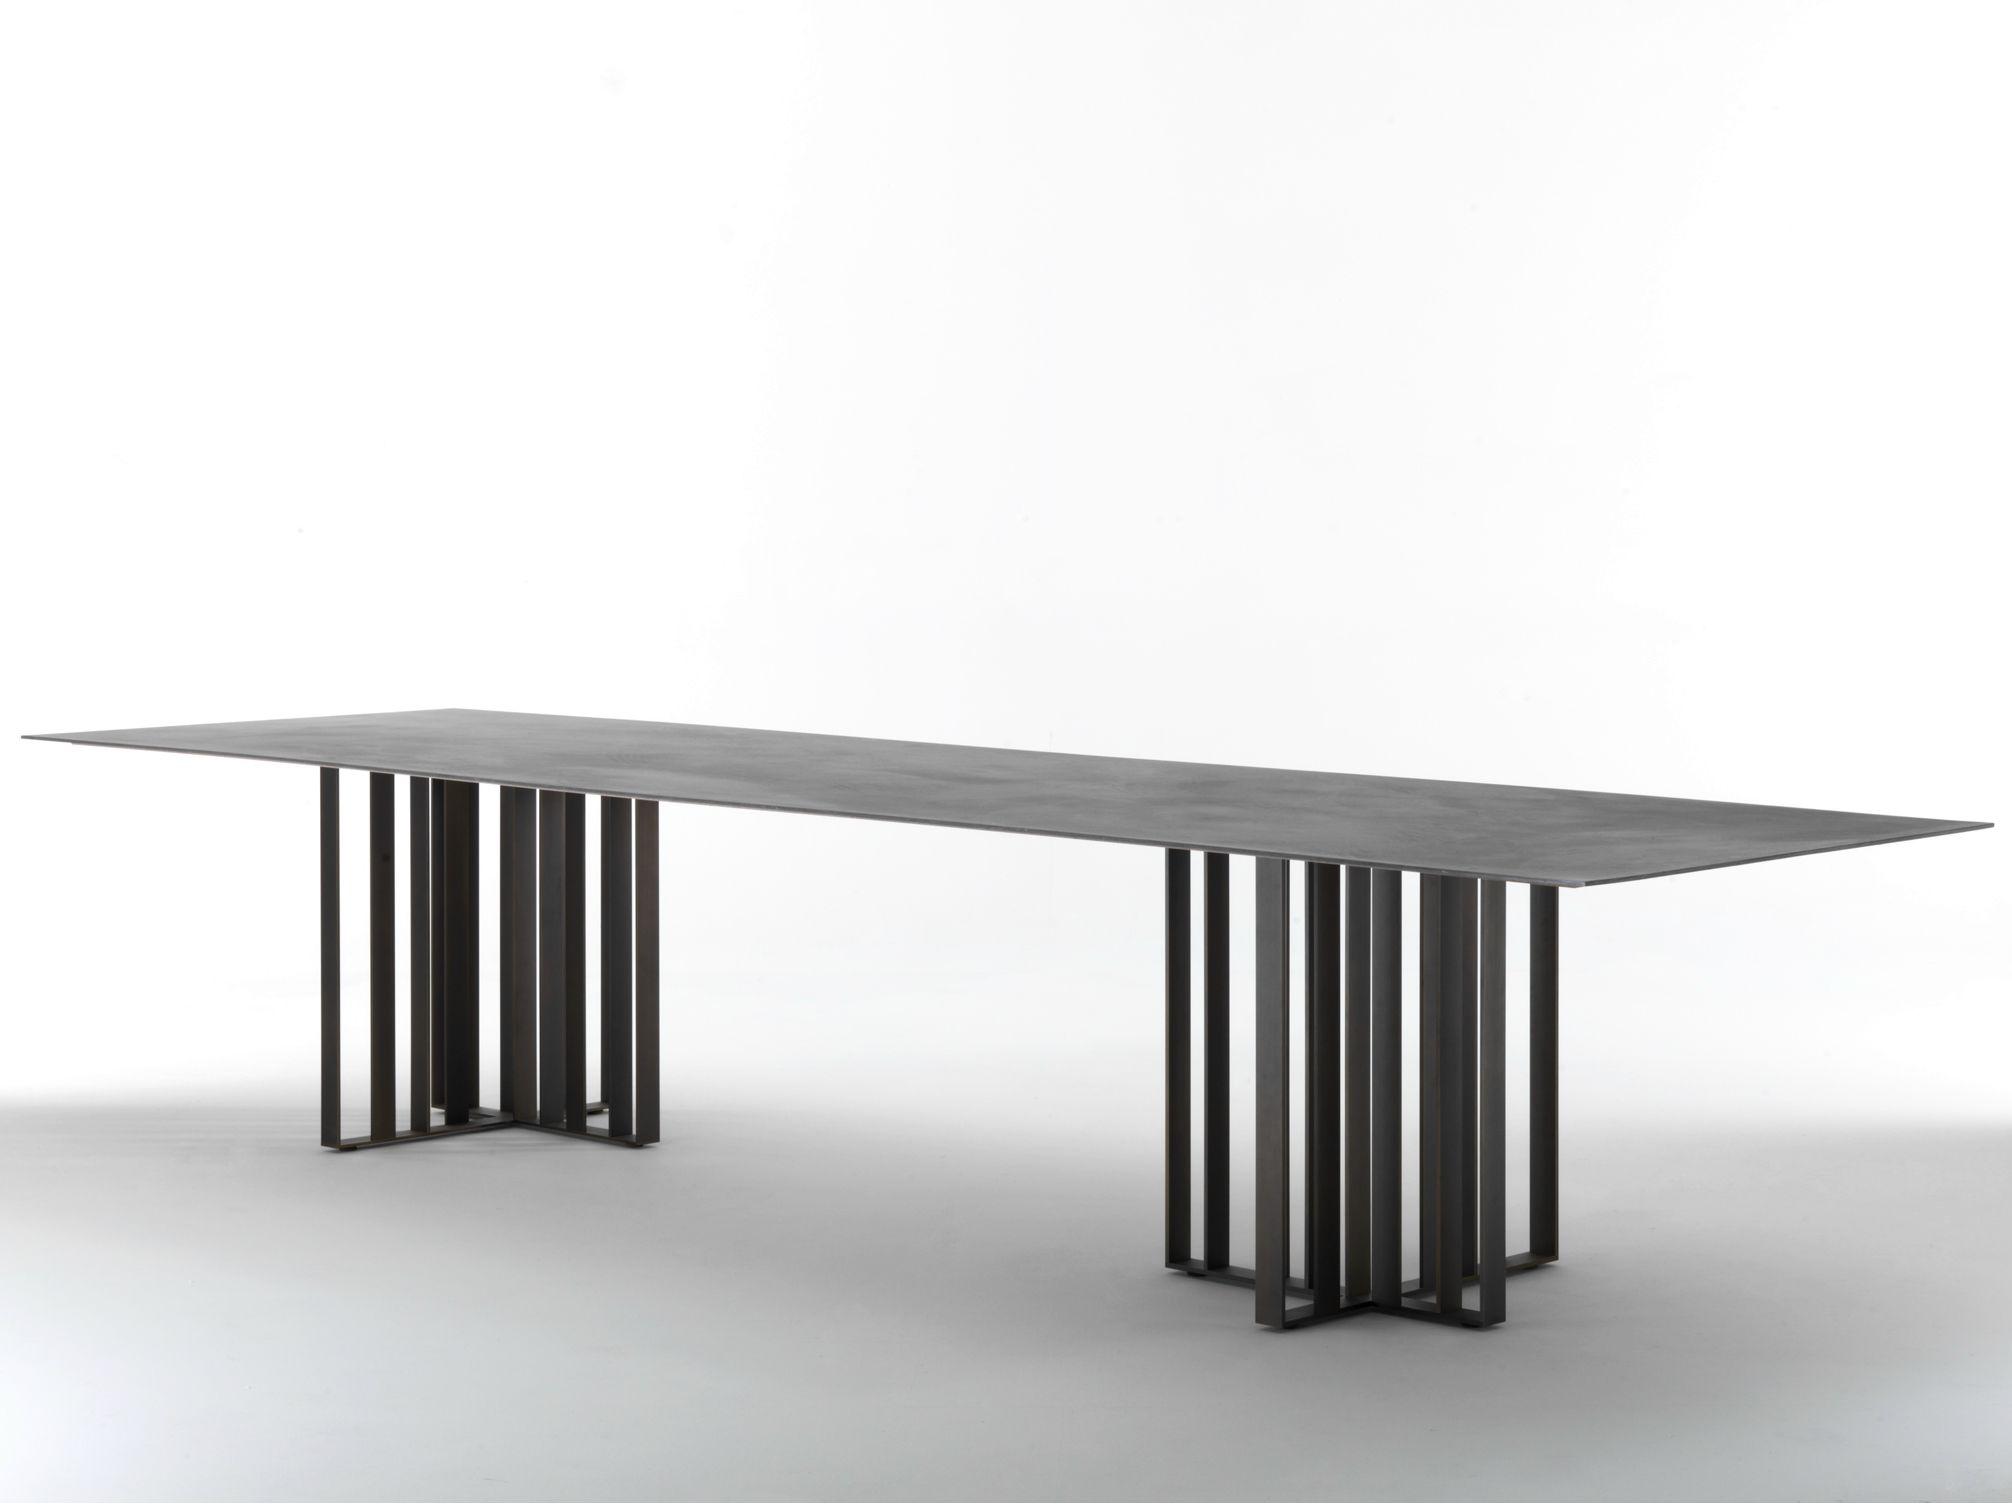 Rectangular Metal Dining Table Shade By Lema Design Francesco